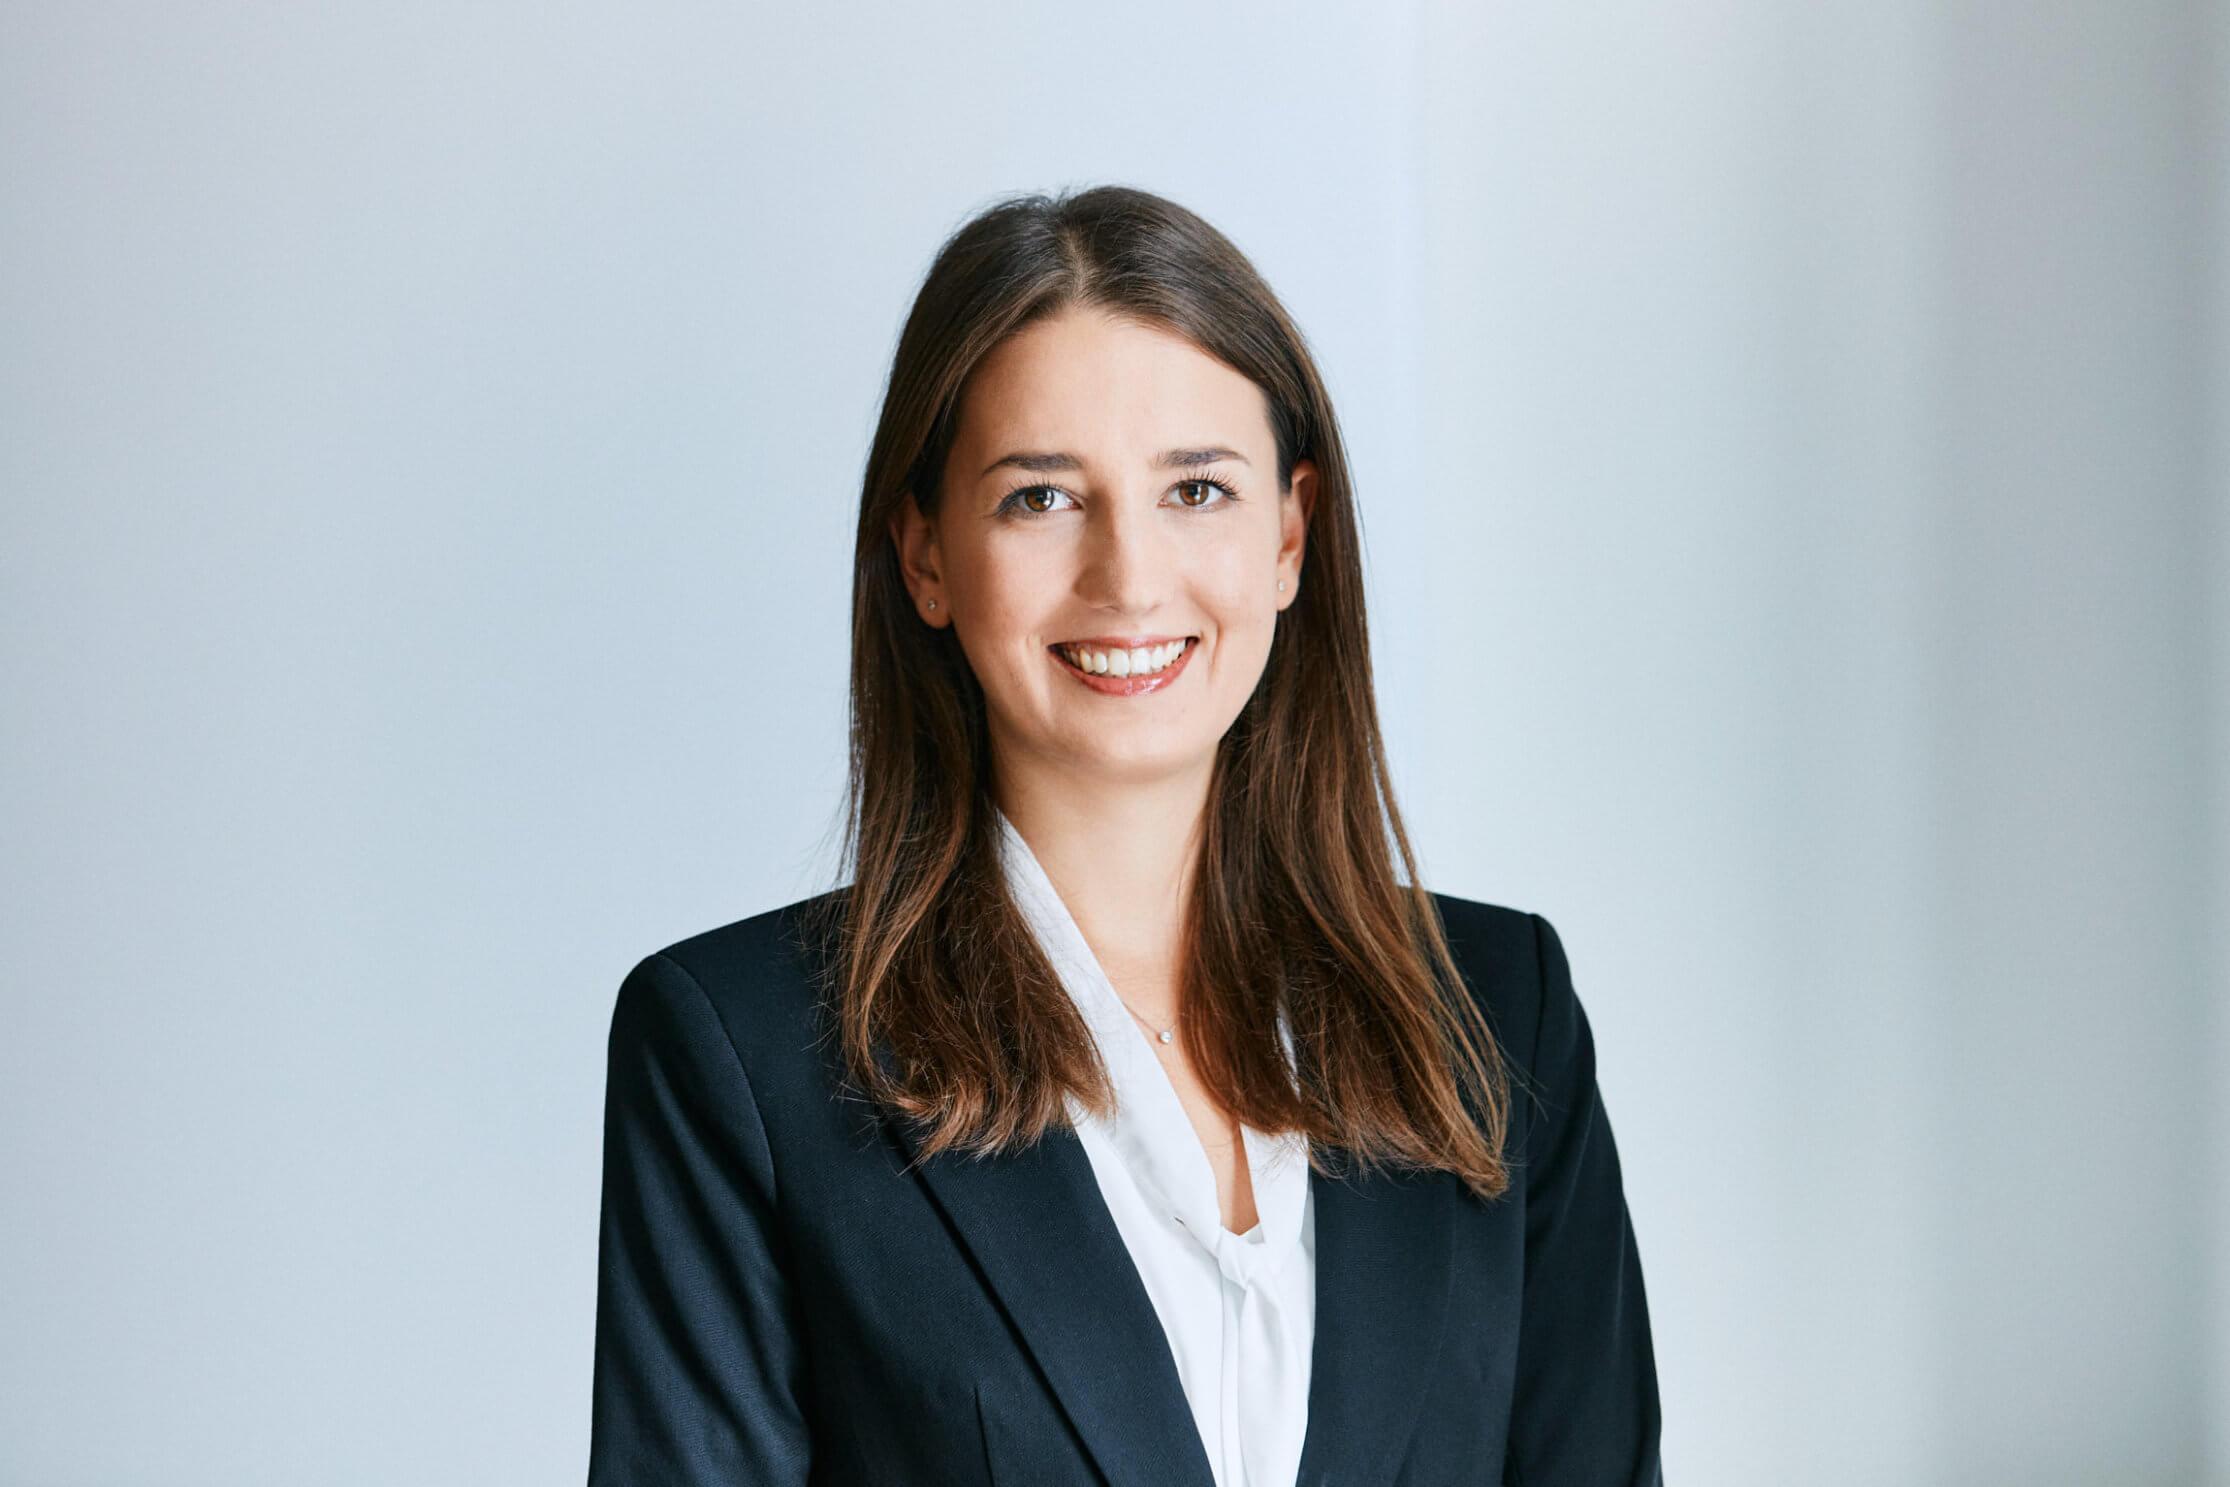 Kristine Zacher